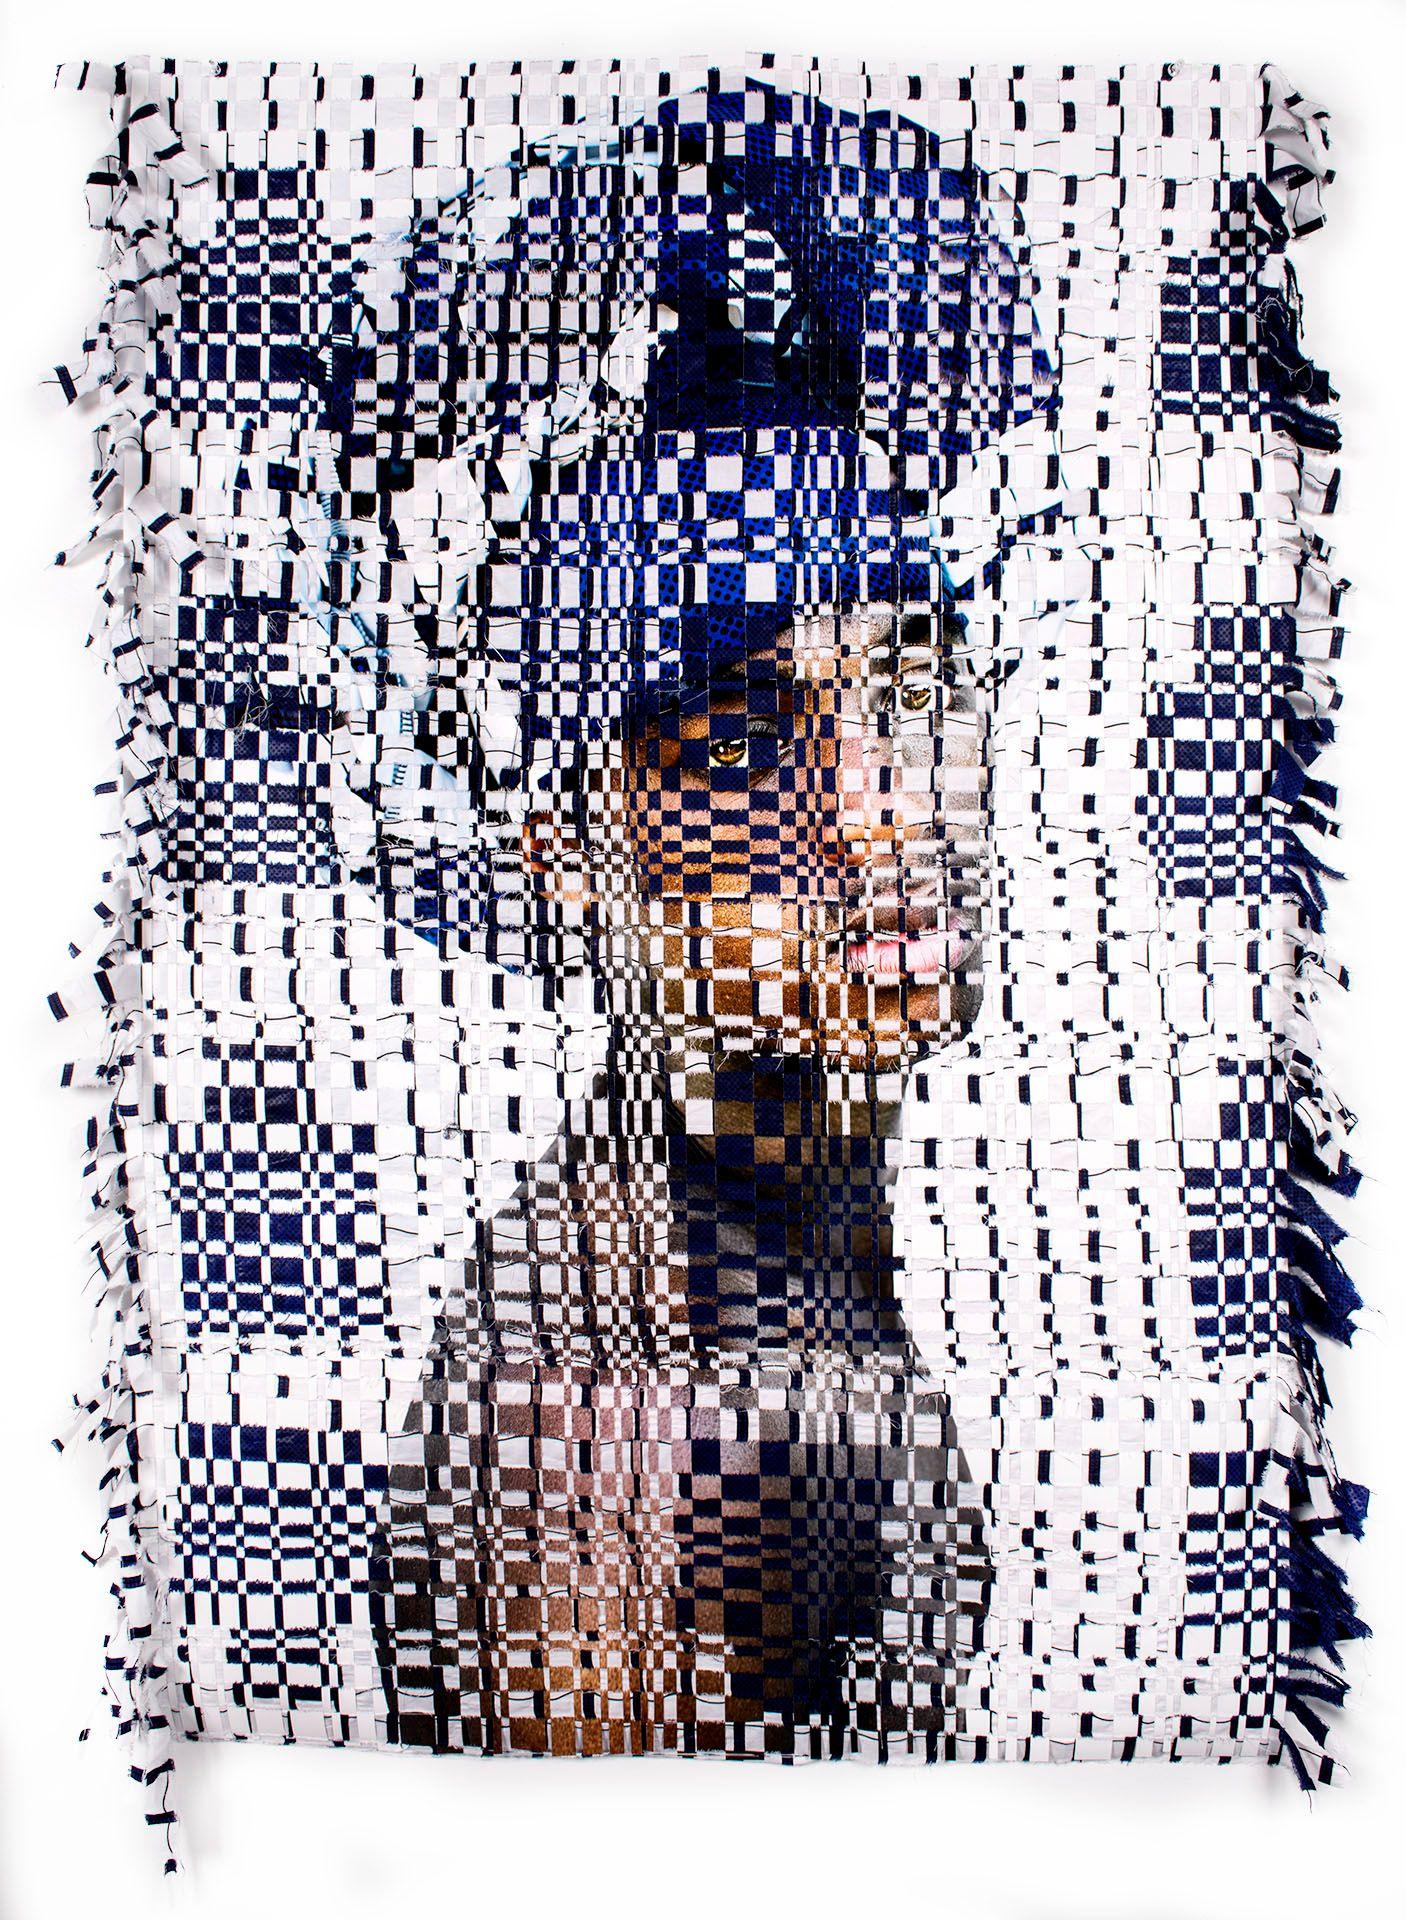 Kyle-Meyer-series1.-Interwoven-imageno.11-Unidentified134.jpg